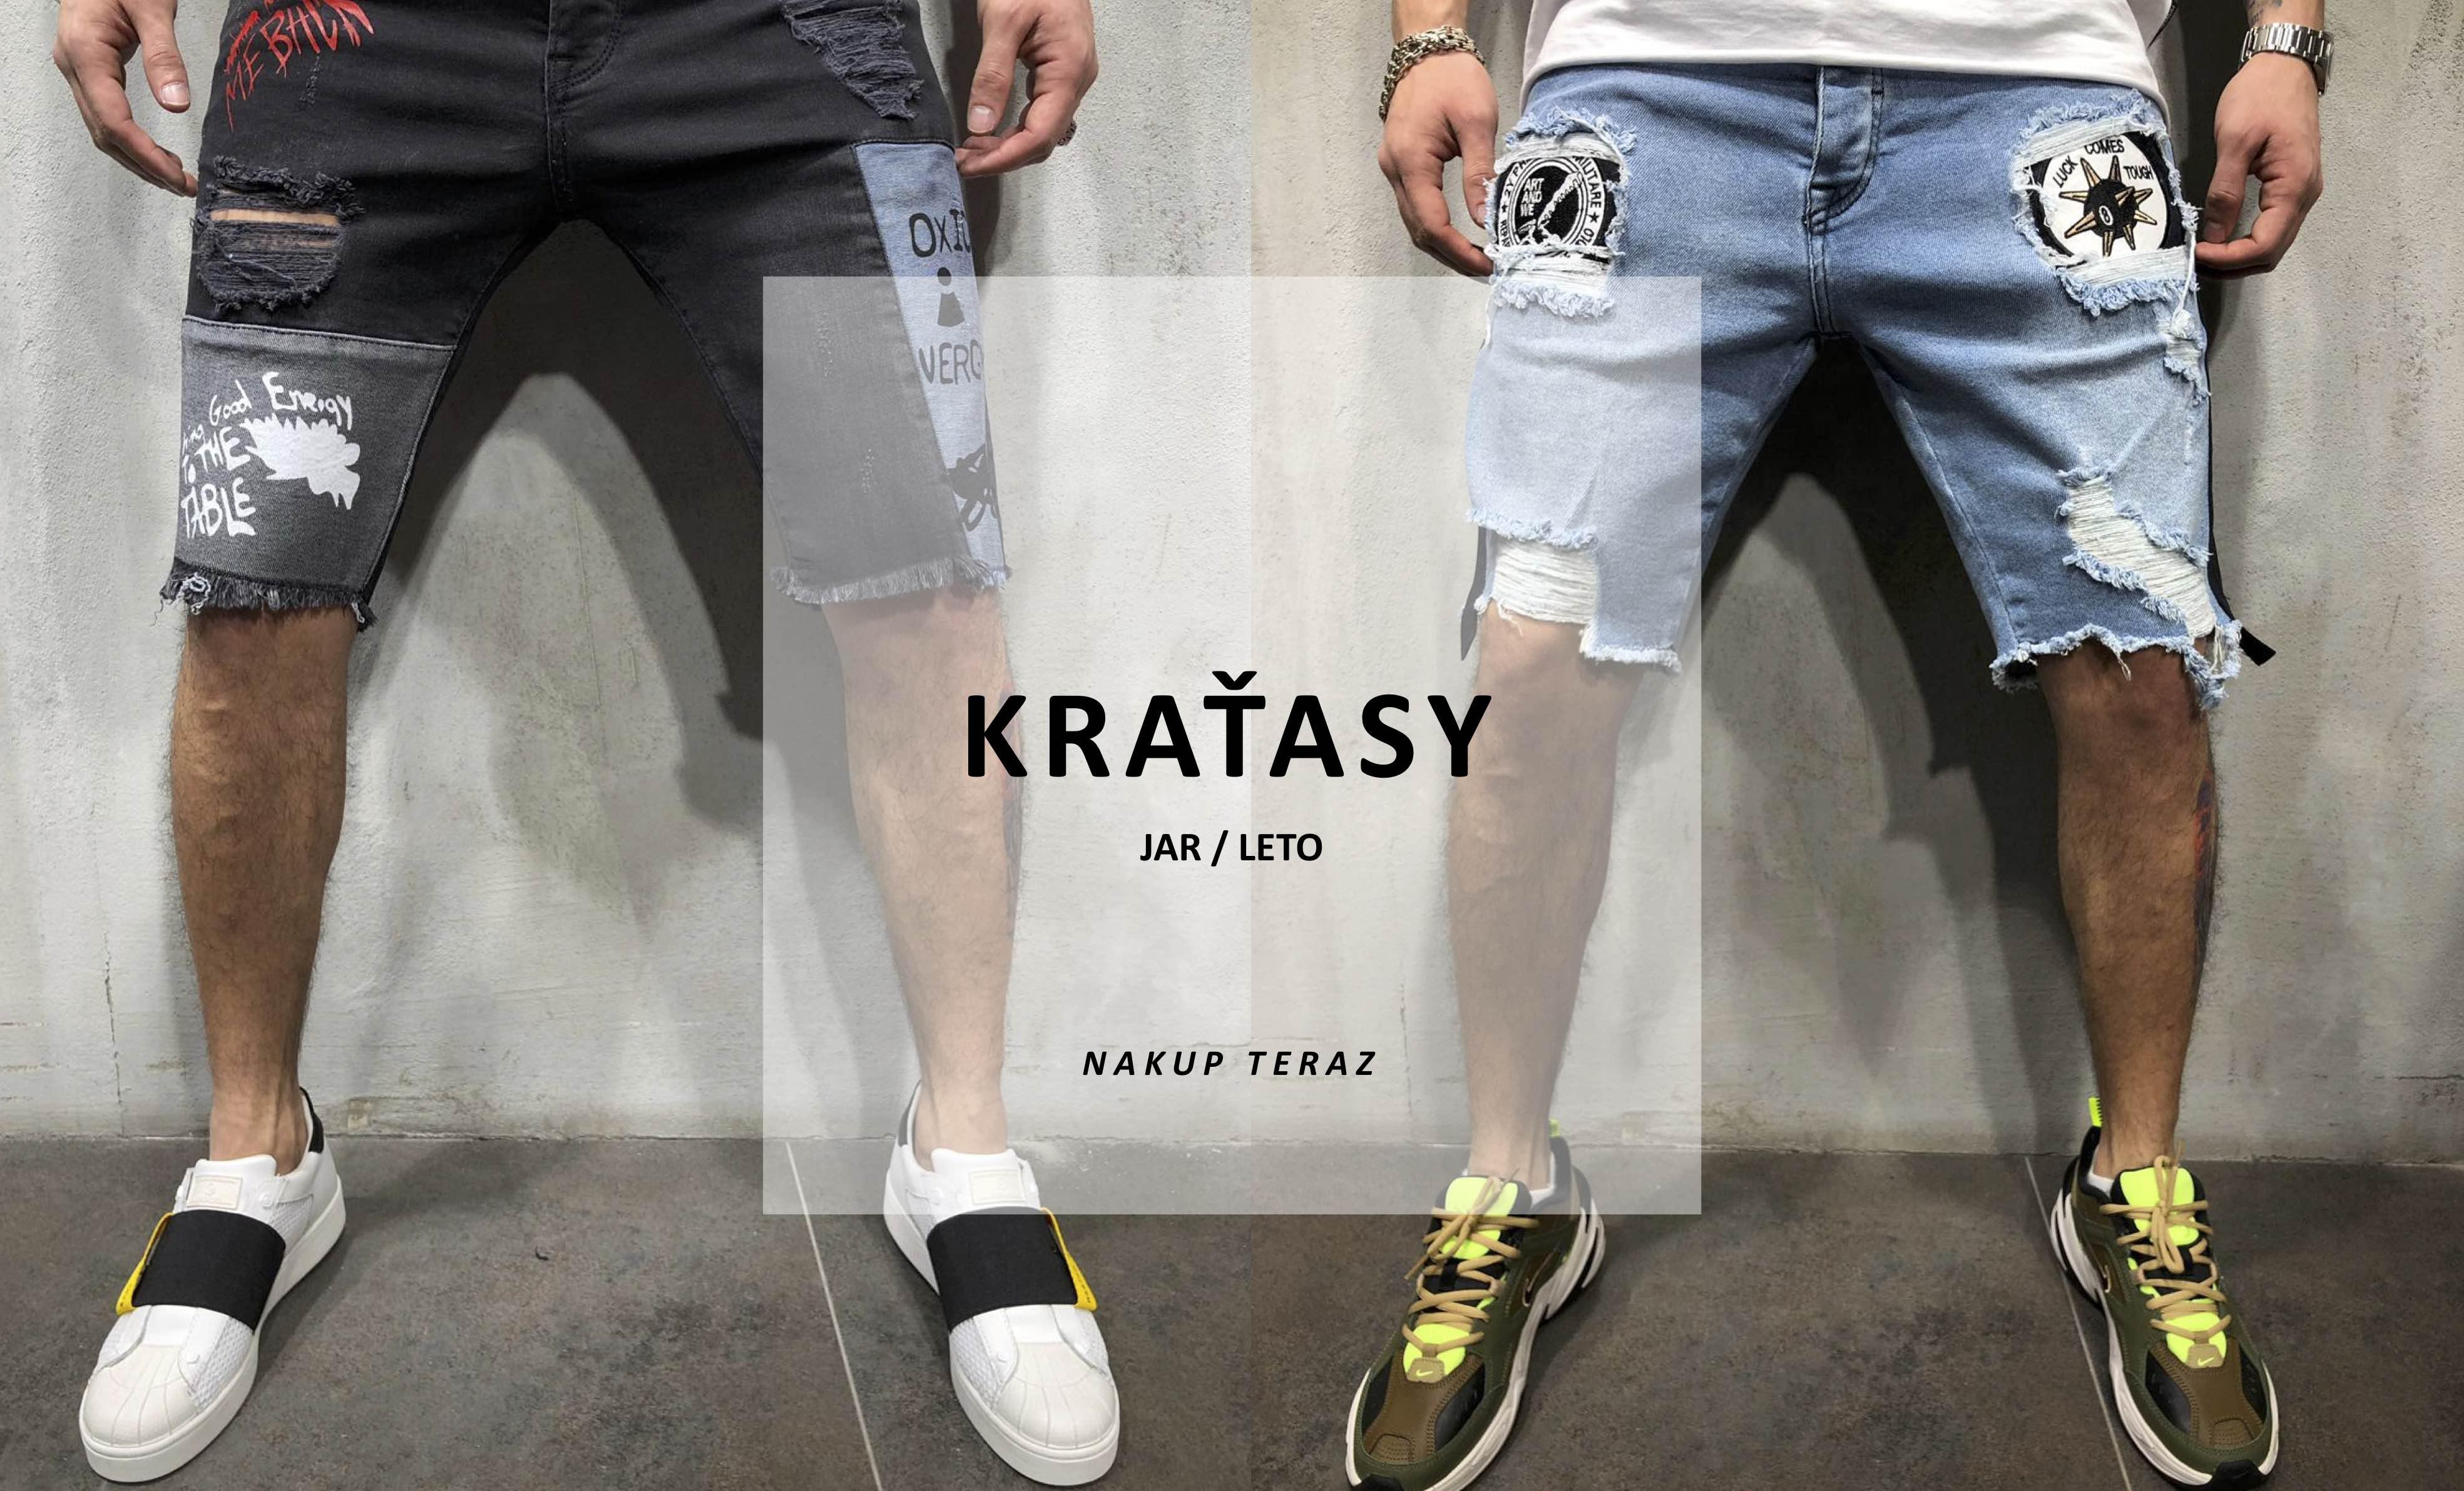 Kratasy